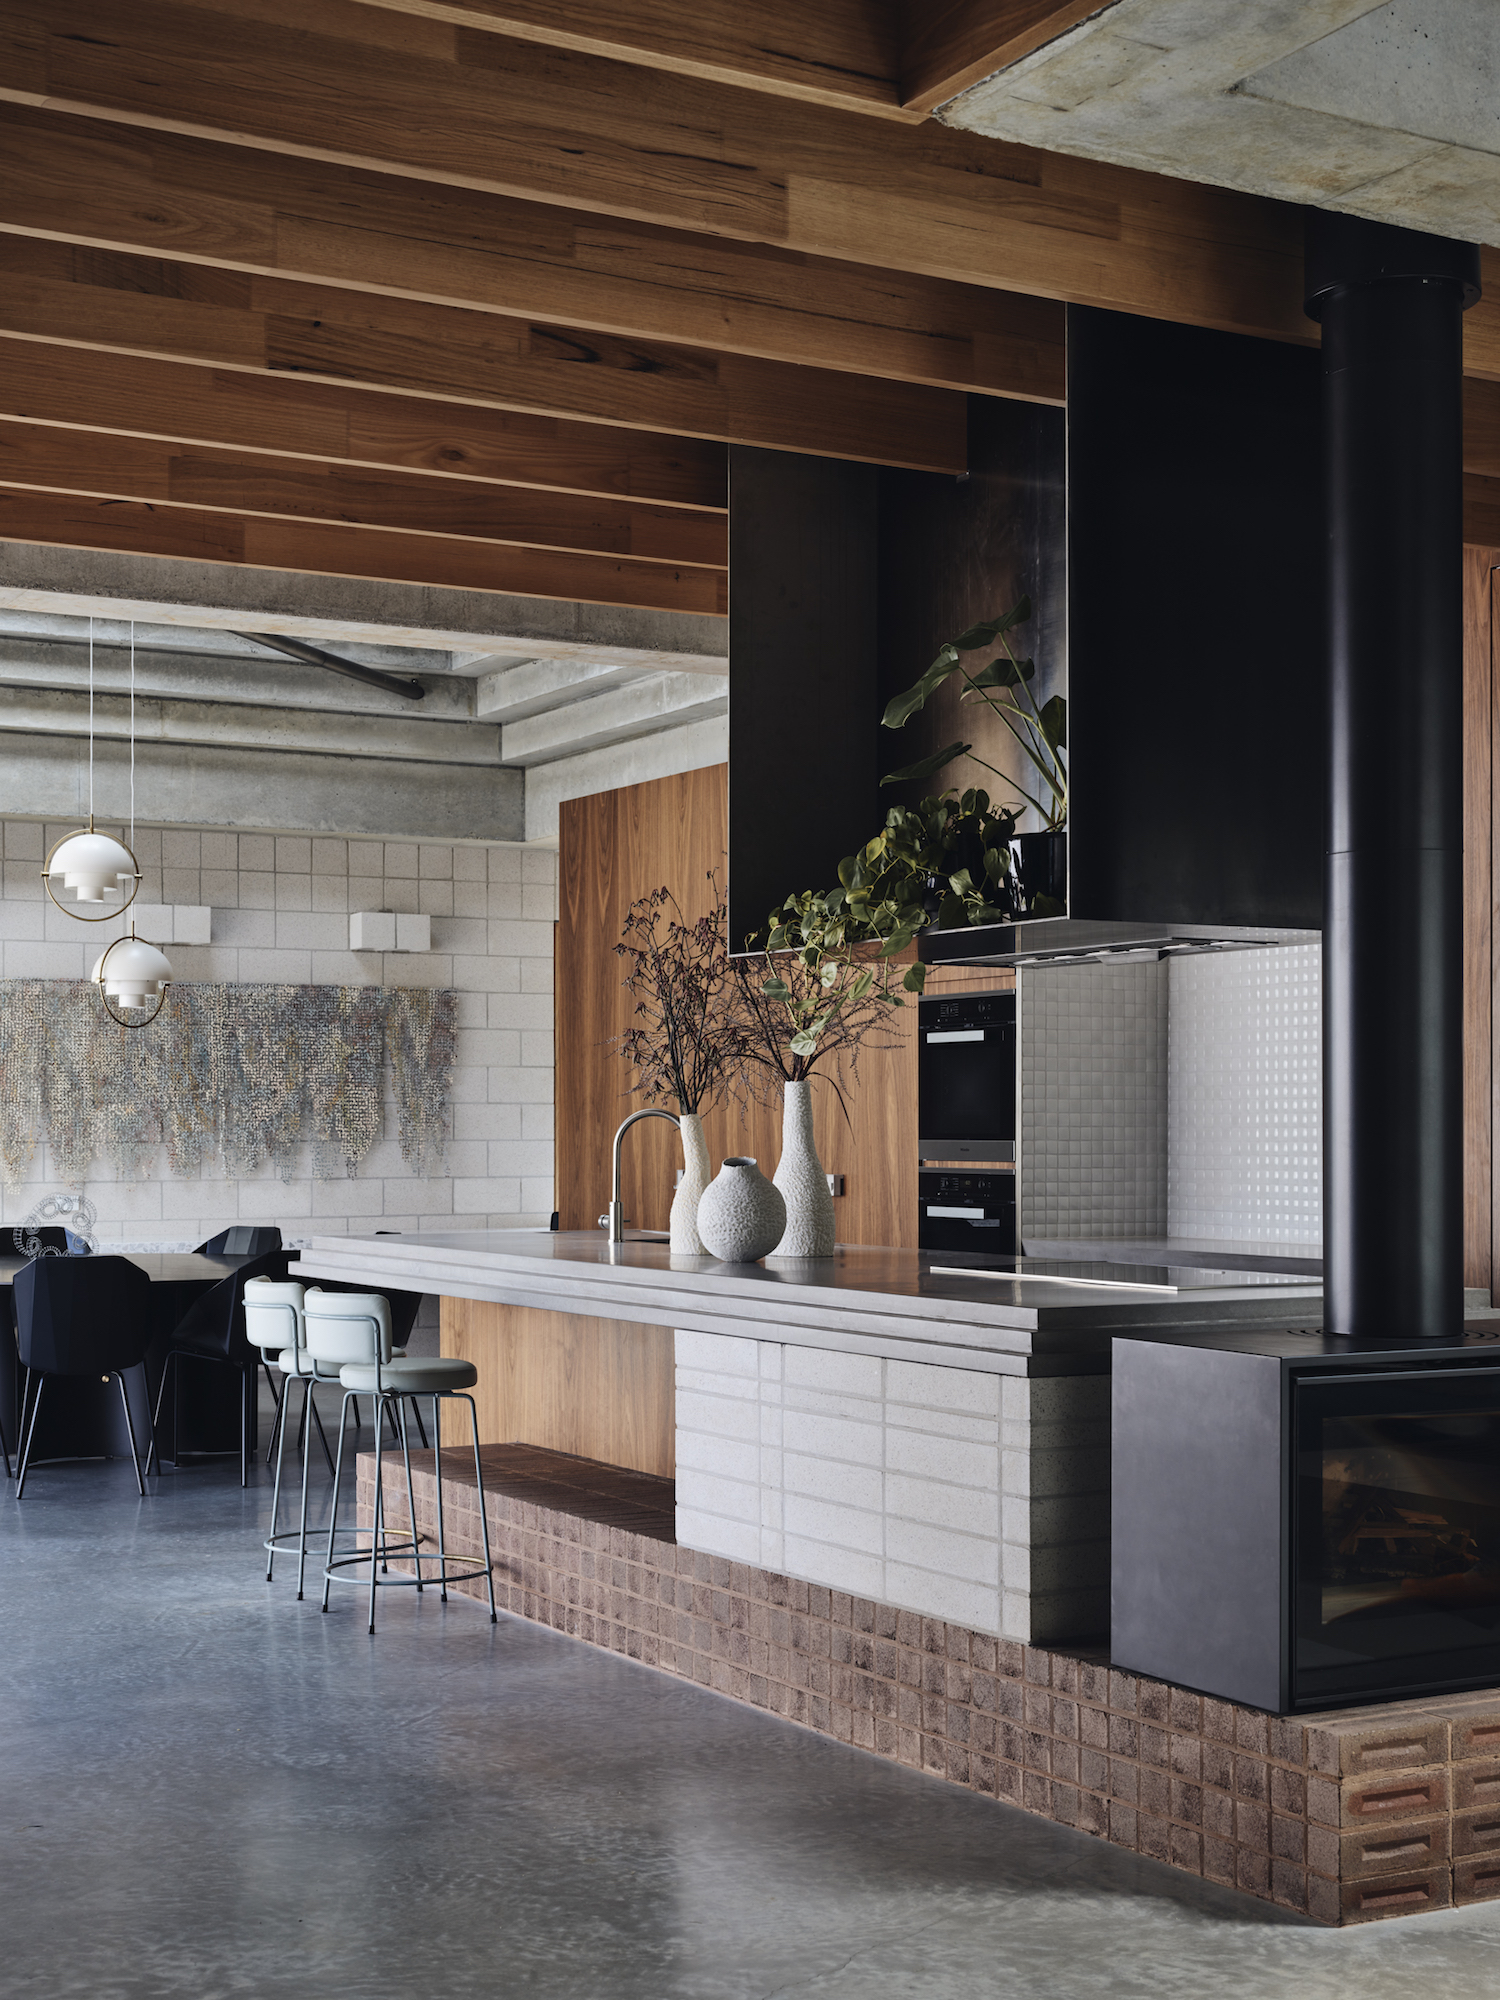 est living bellows house architects EAT 4